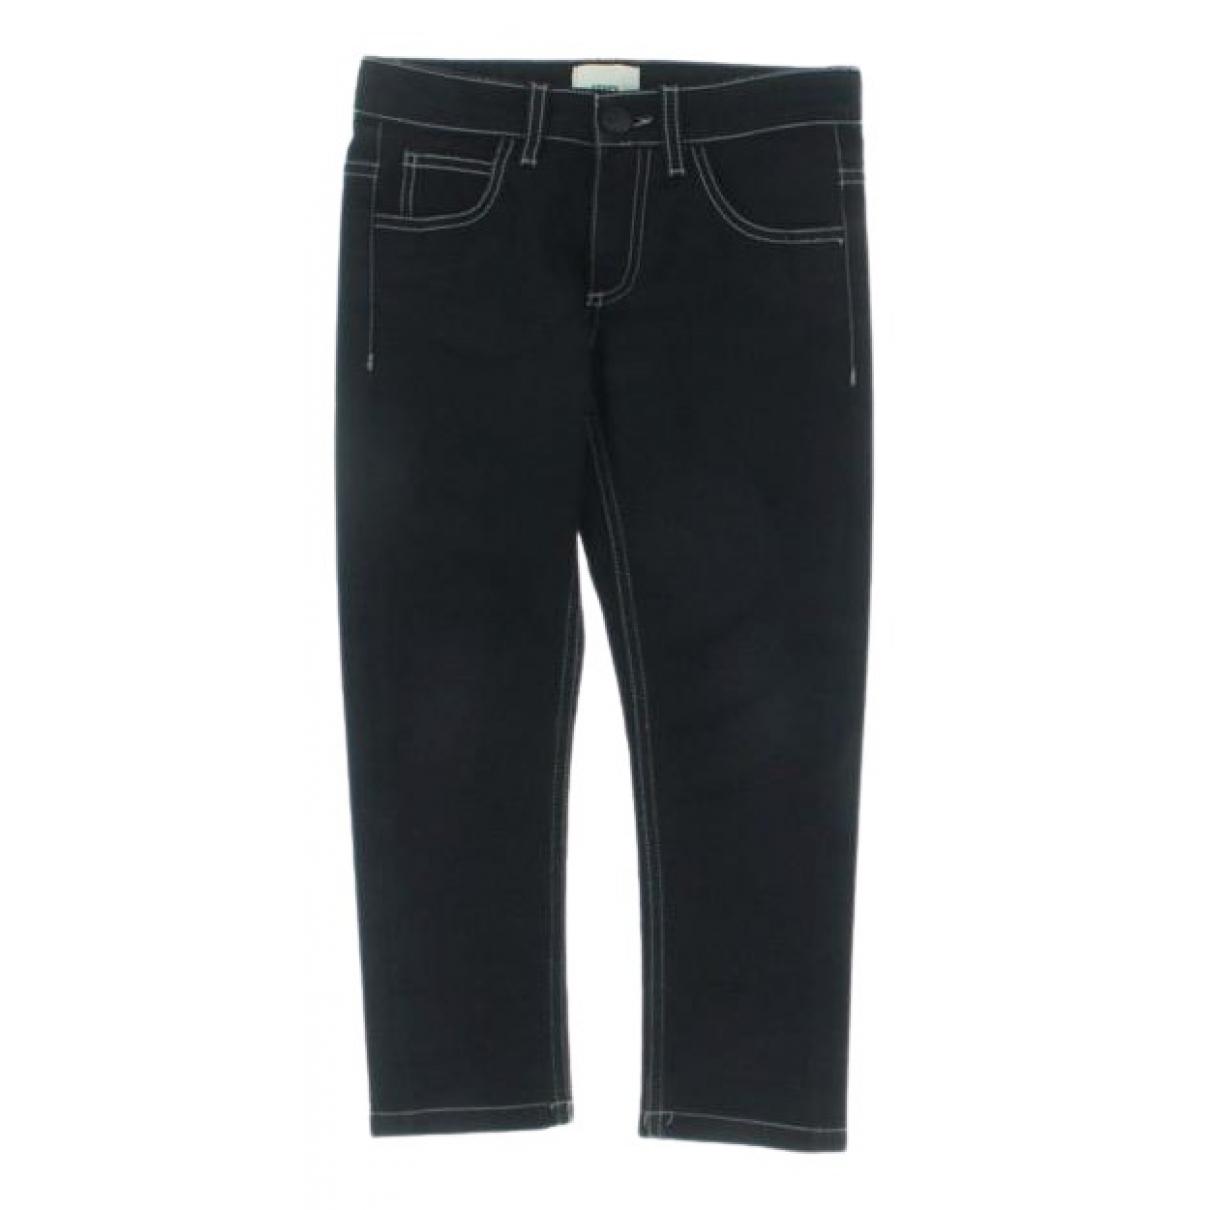 Fendi \N Black Cotton Trousers for Women 8 US